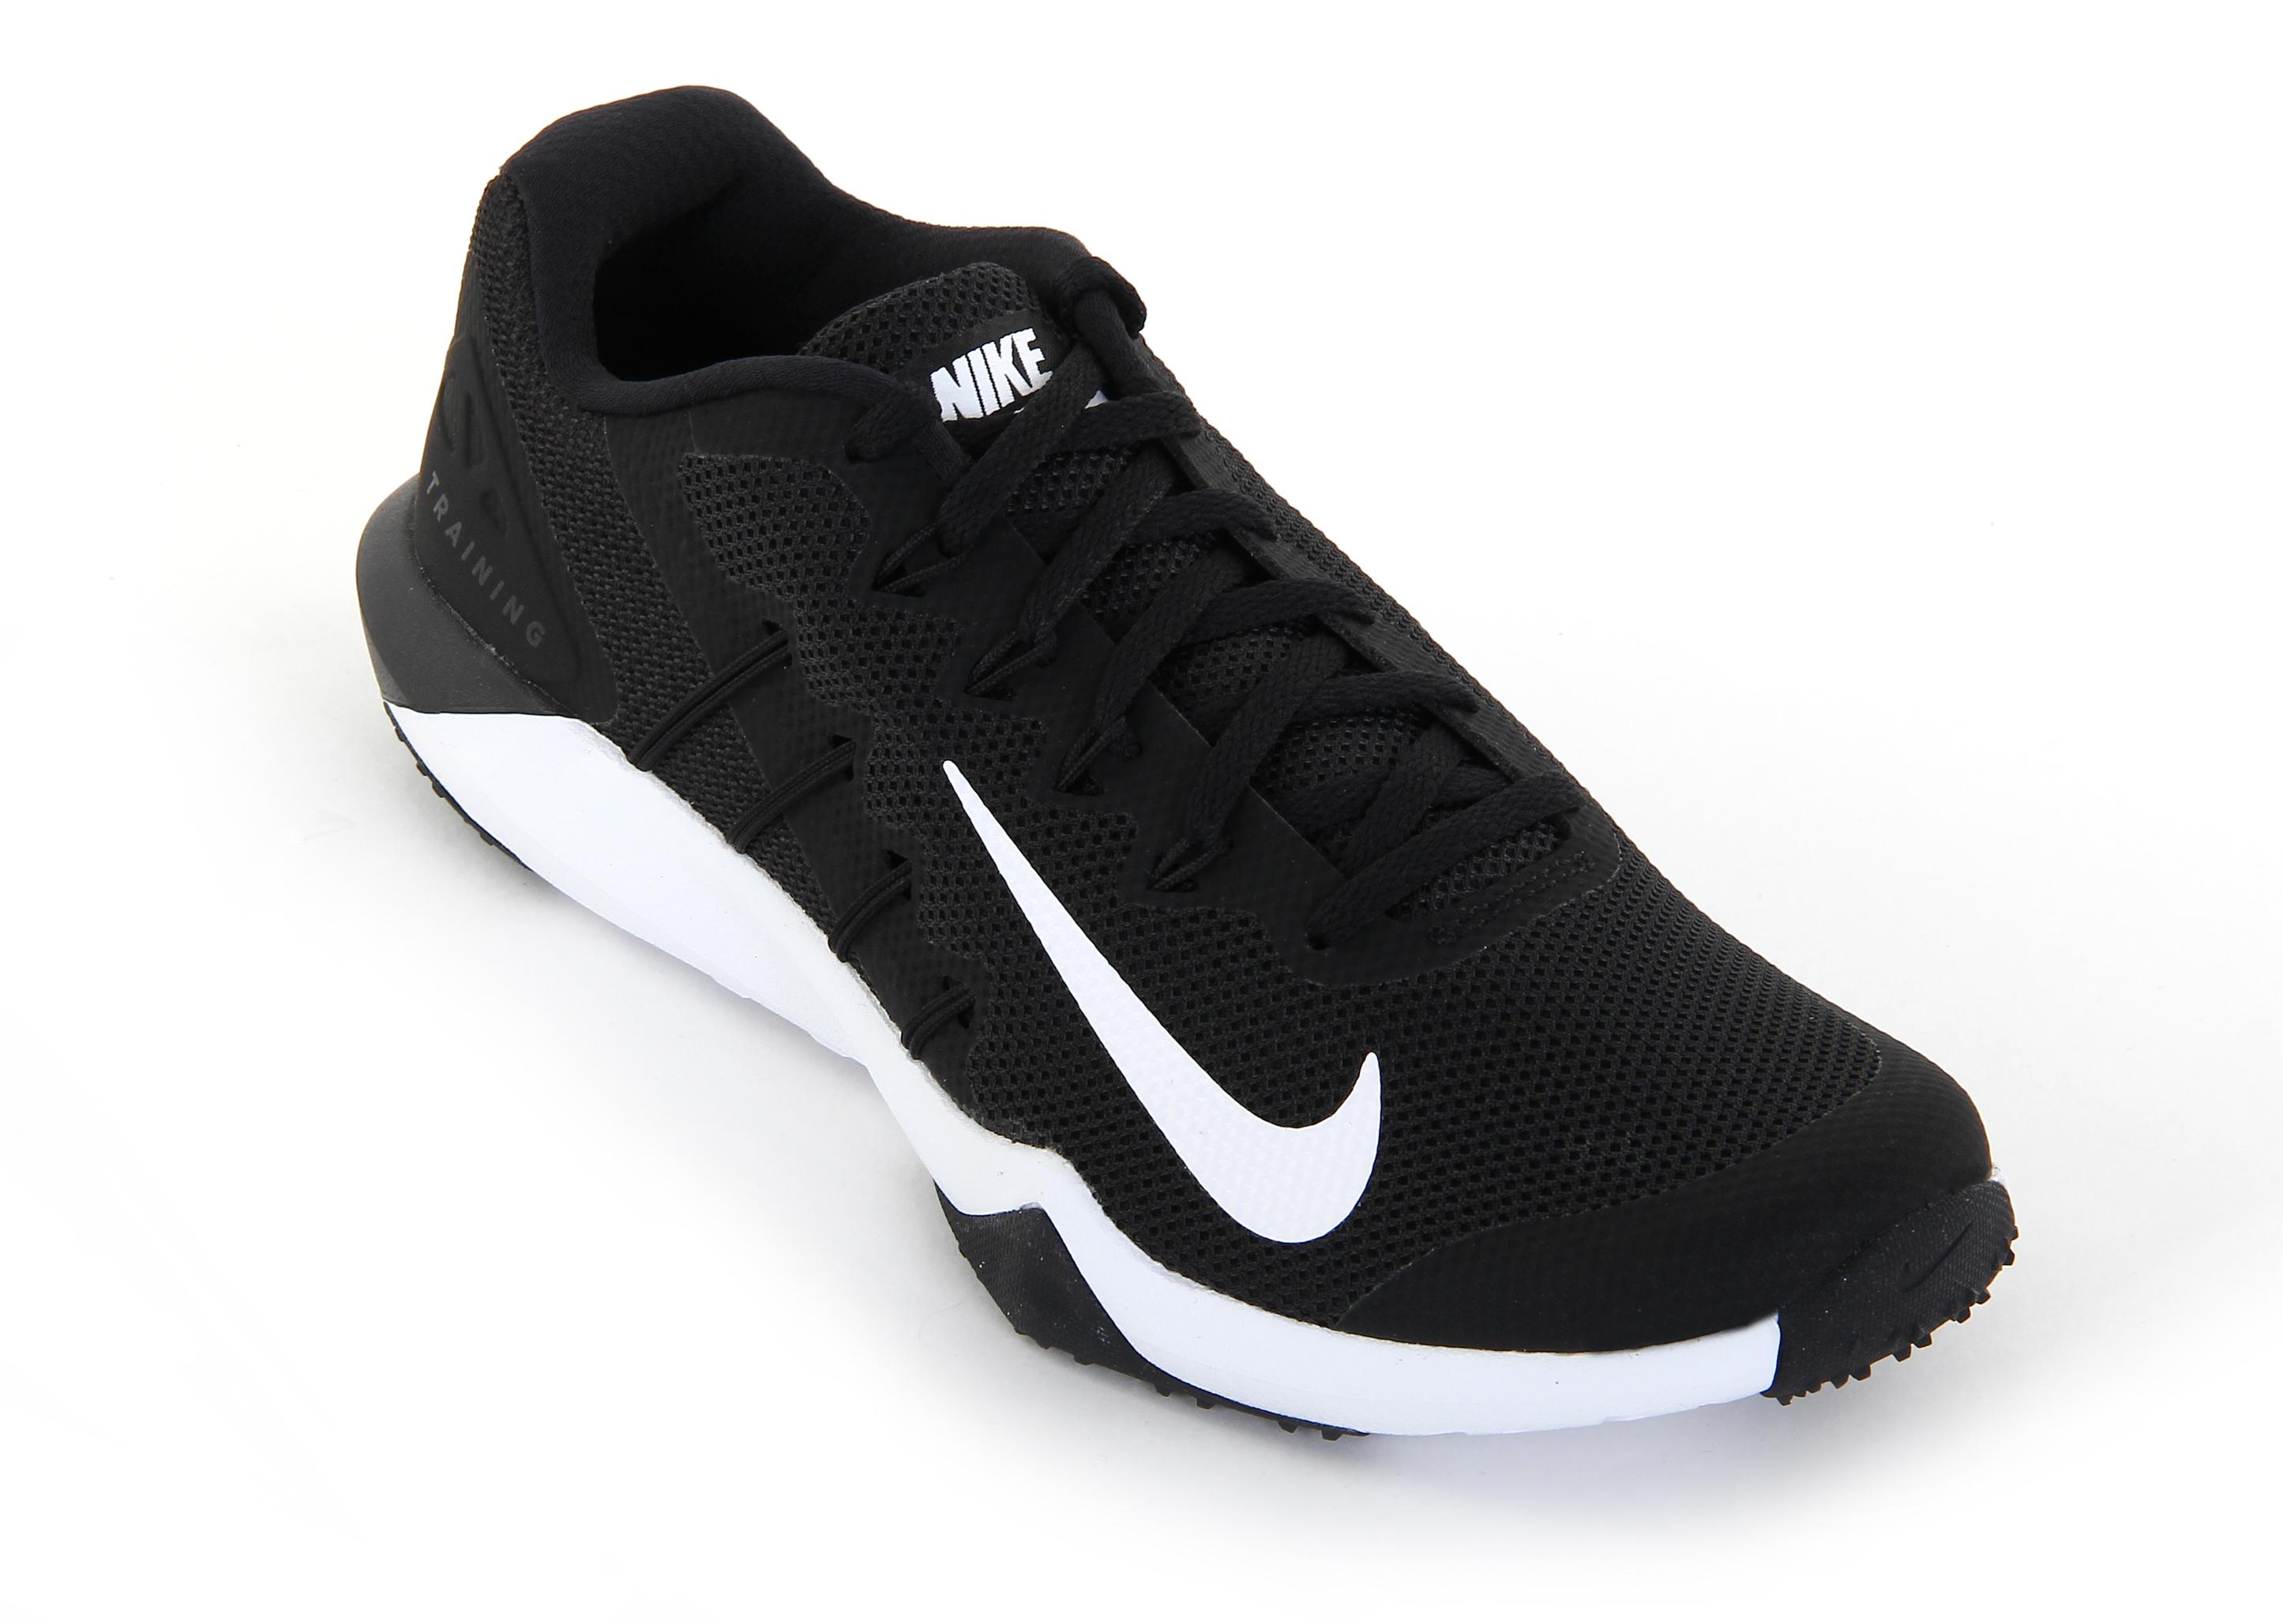 innovative design 44dfe 45367 Кроссовки мужские Nike Retaliation Trainer 2